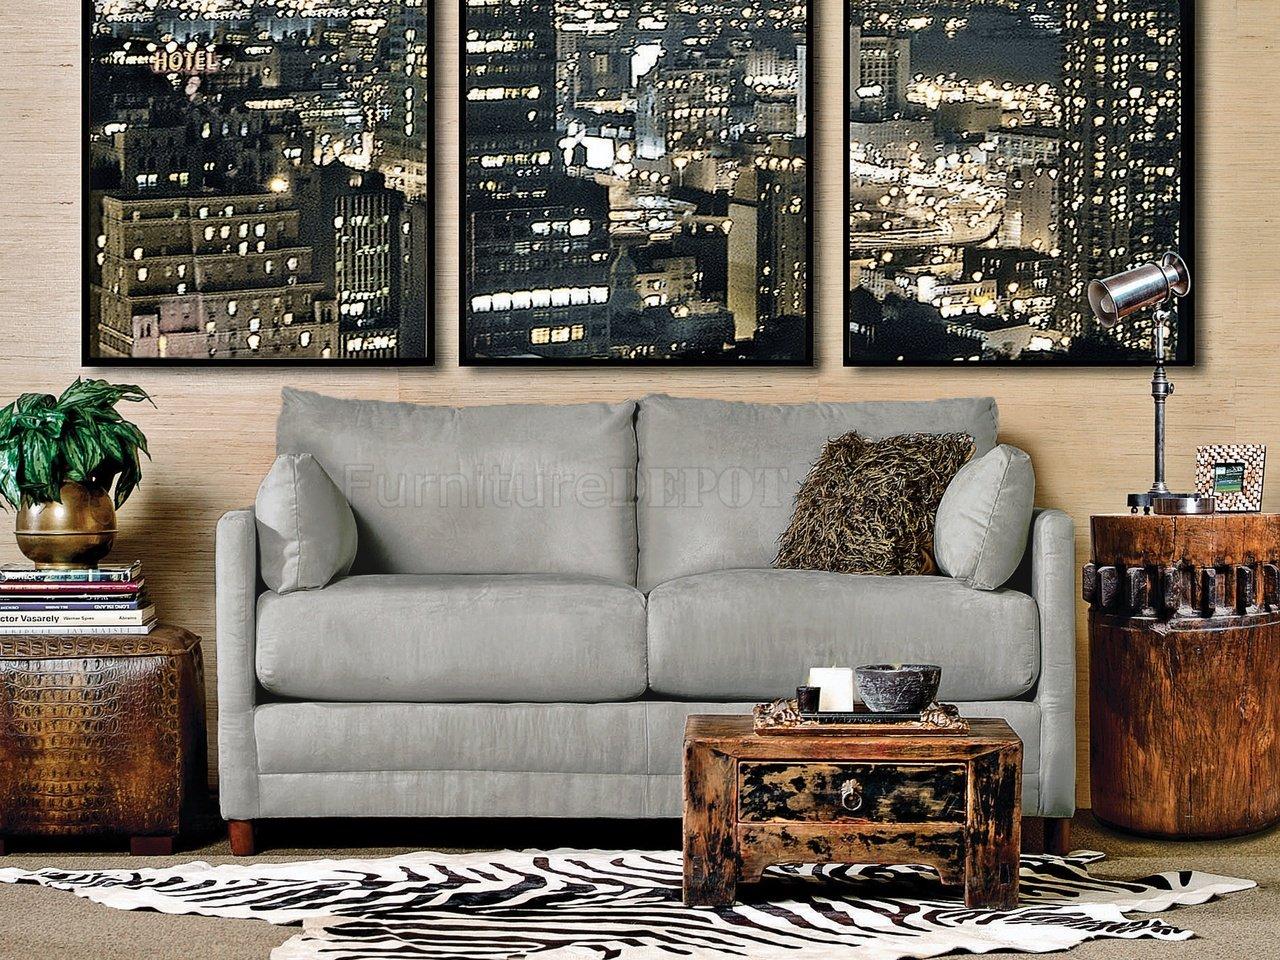 Softee Sofa Bed In Grey Fabric By Mstar W Full Sleeper